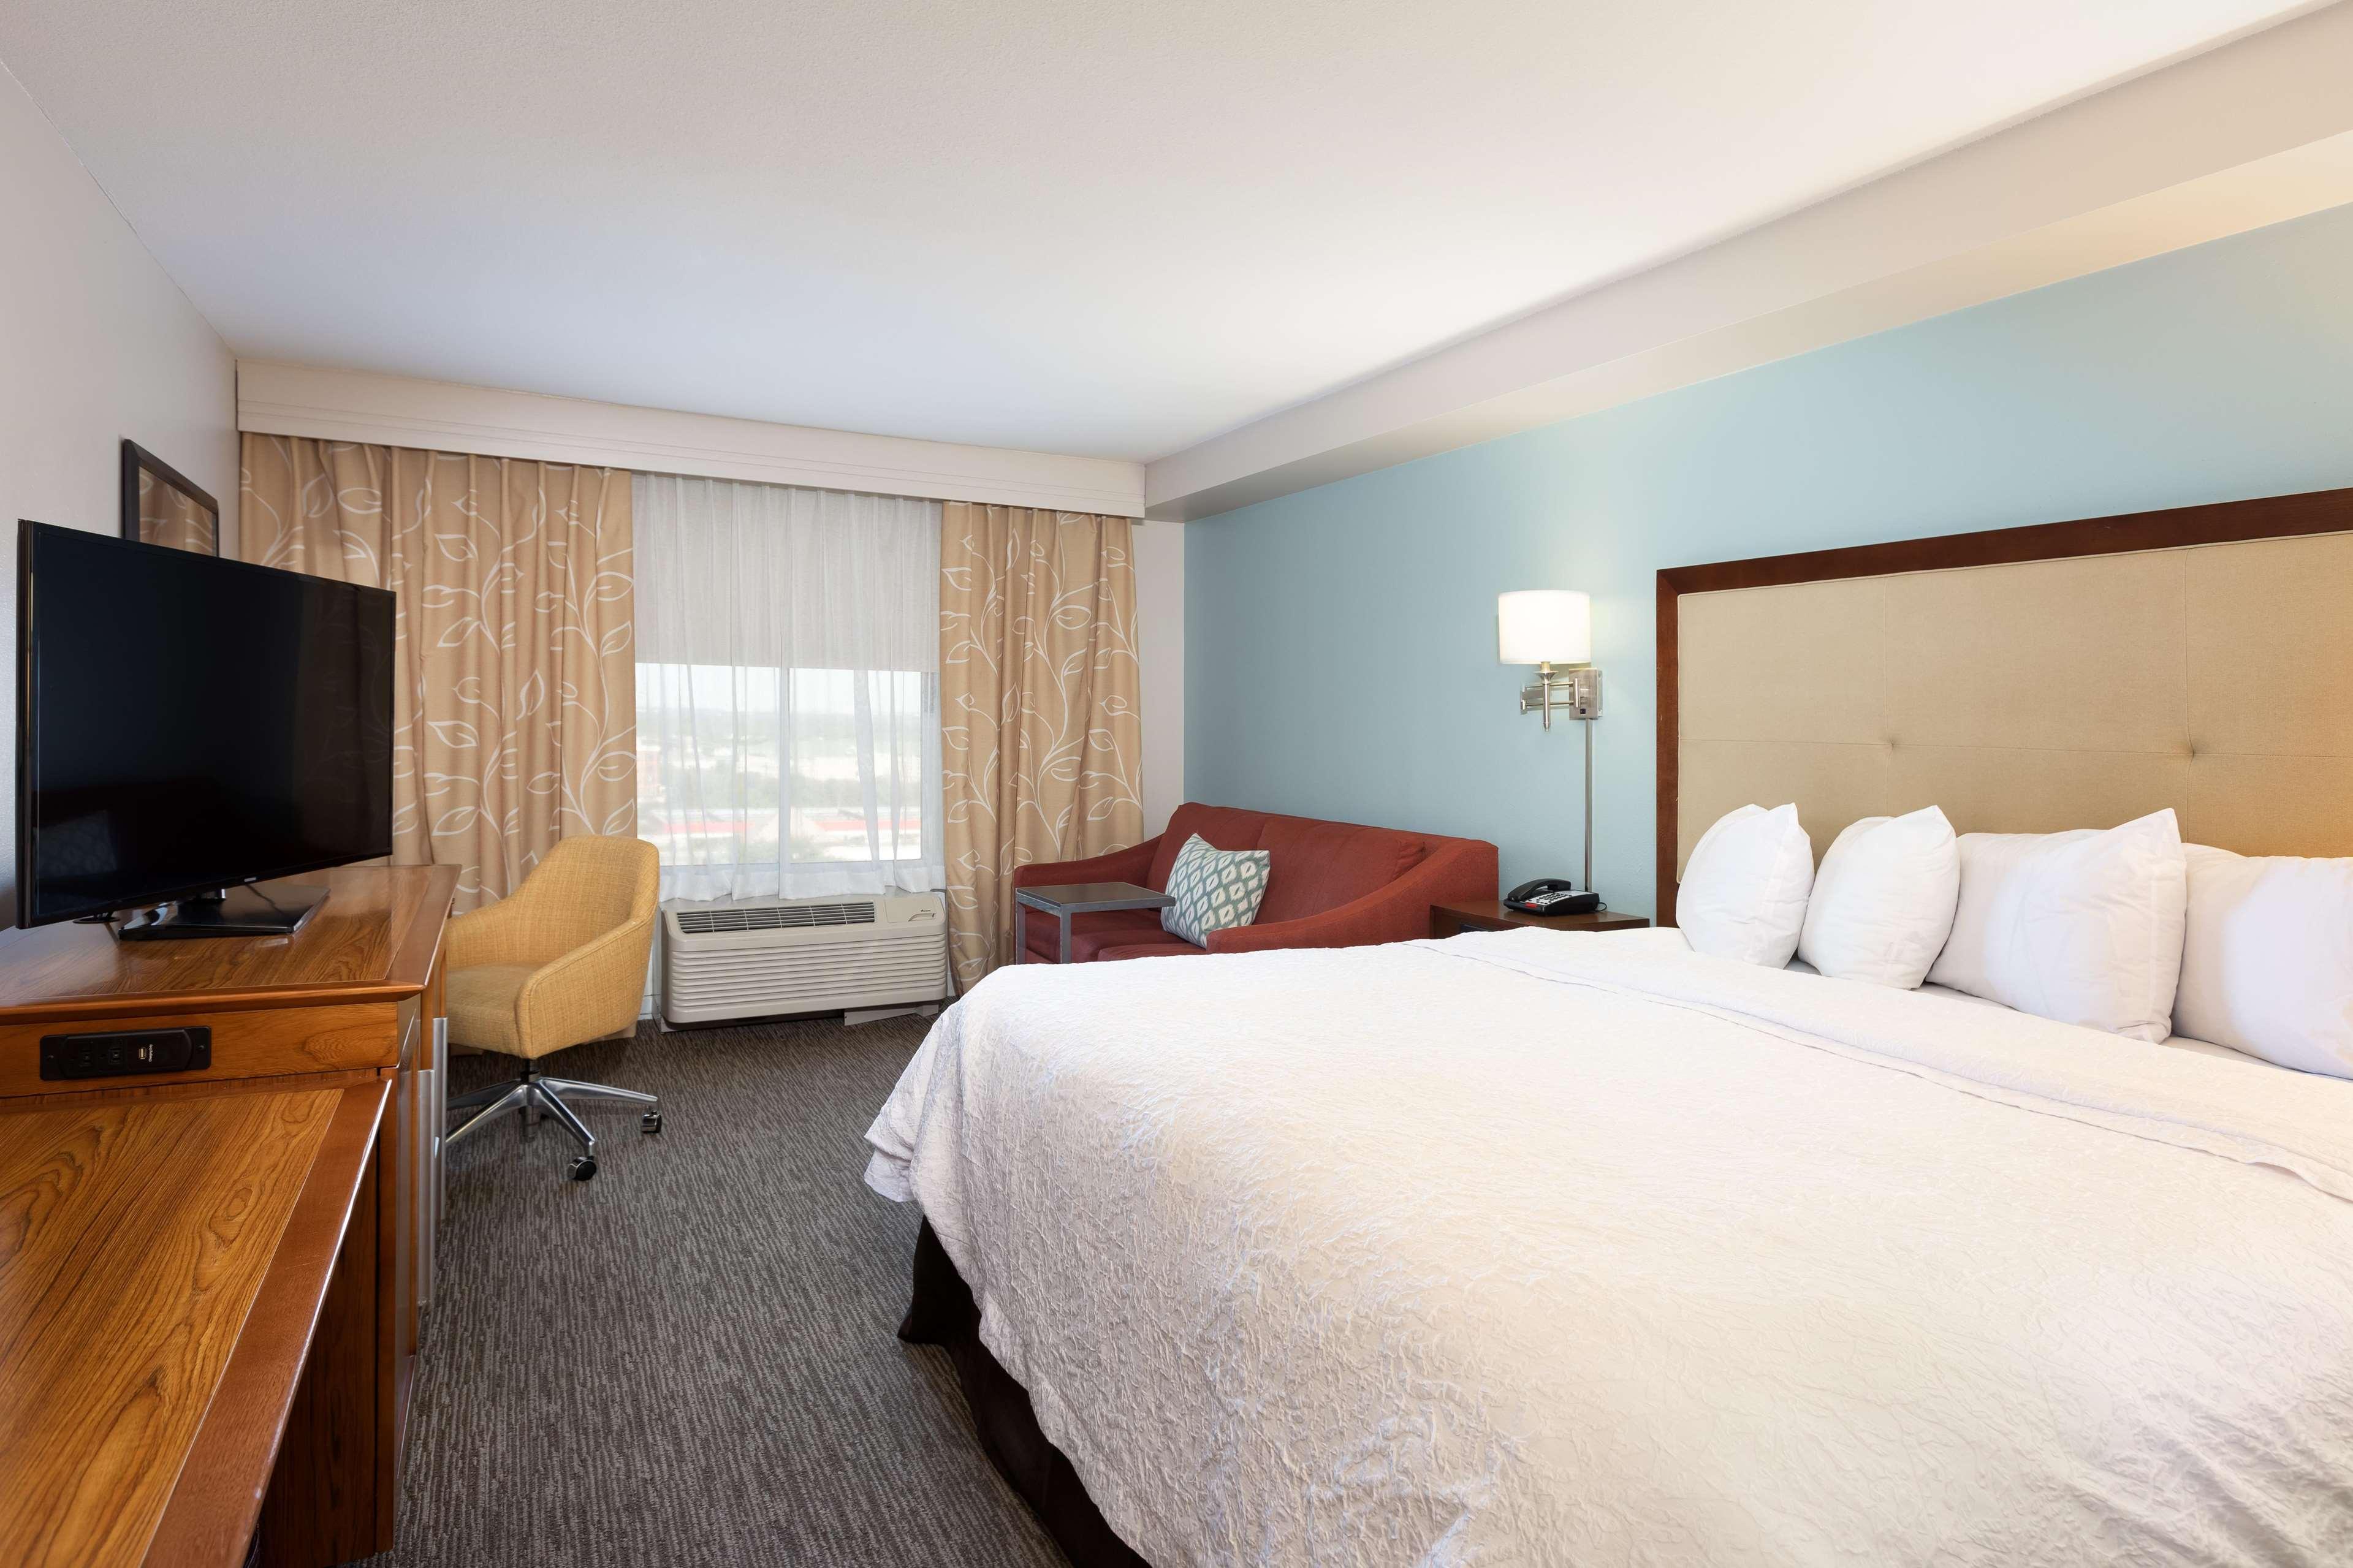 Hampton Inn & Suites Austin-Airport image 43